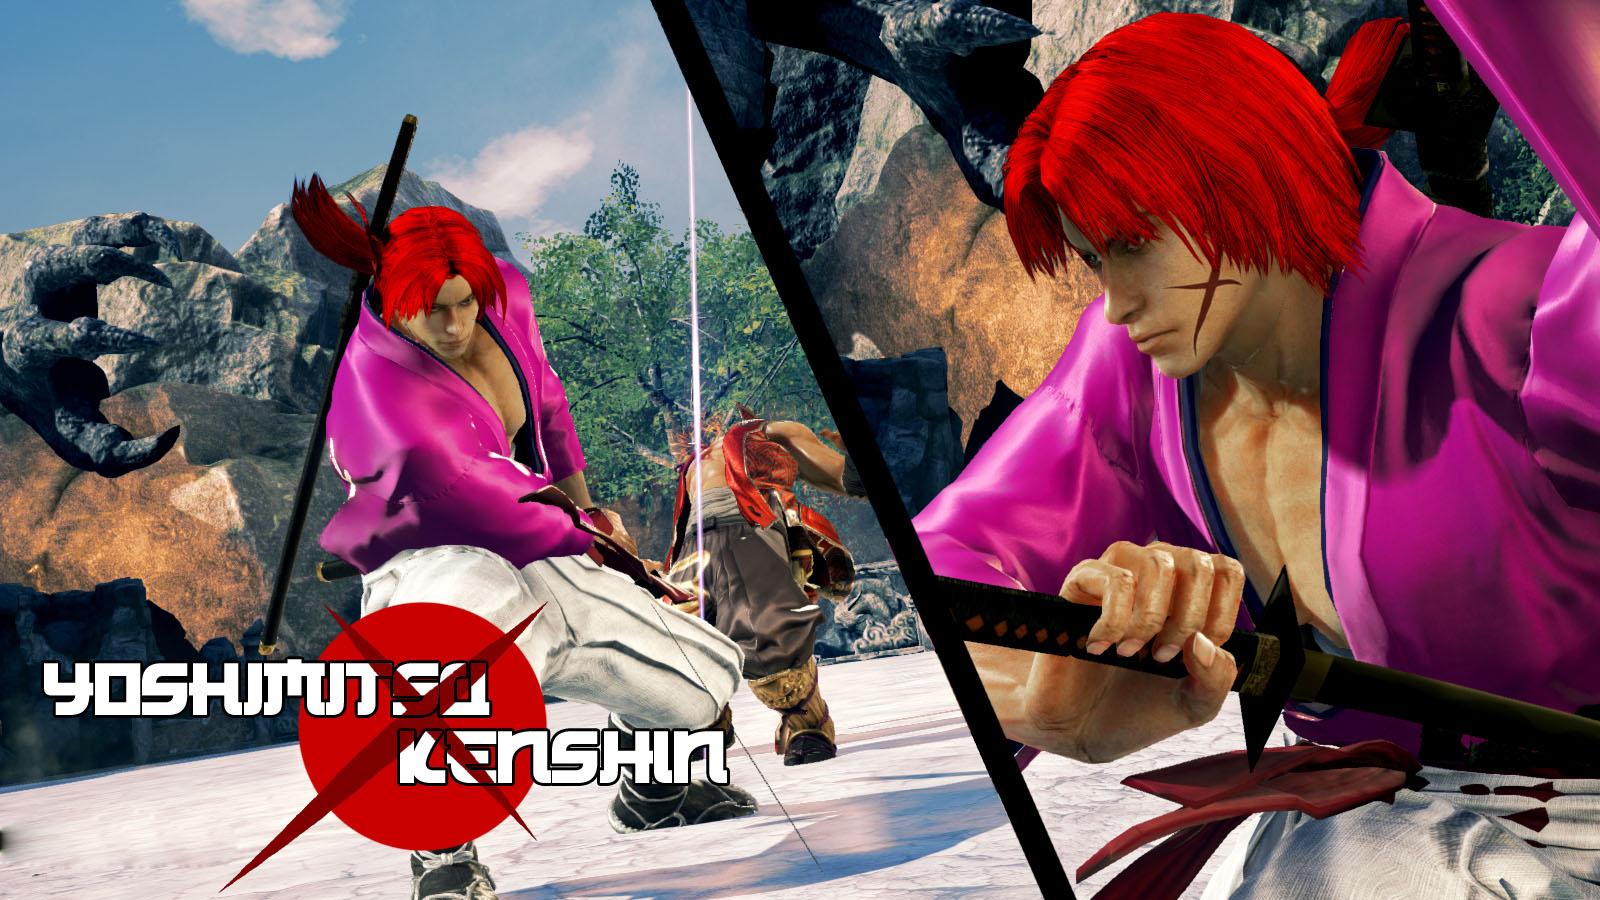 Tekken 7 Yoshimitsu Kenshin Himura Mod By Thebigbenj On Deviantart